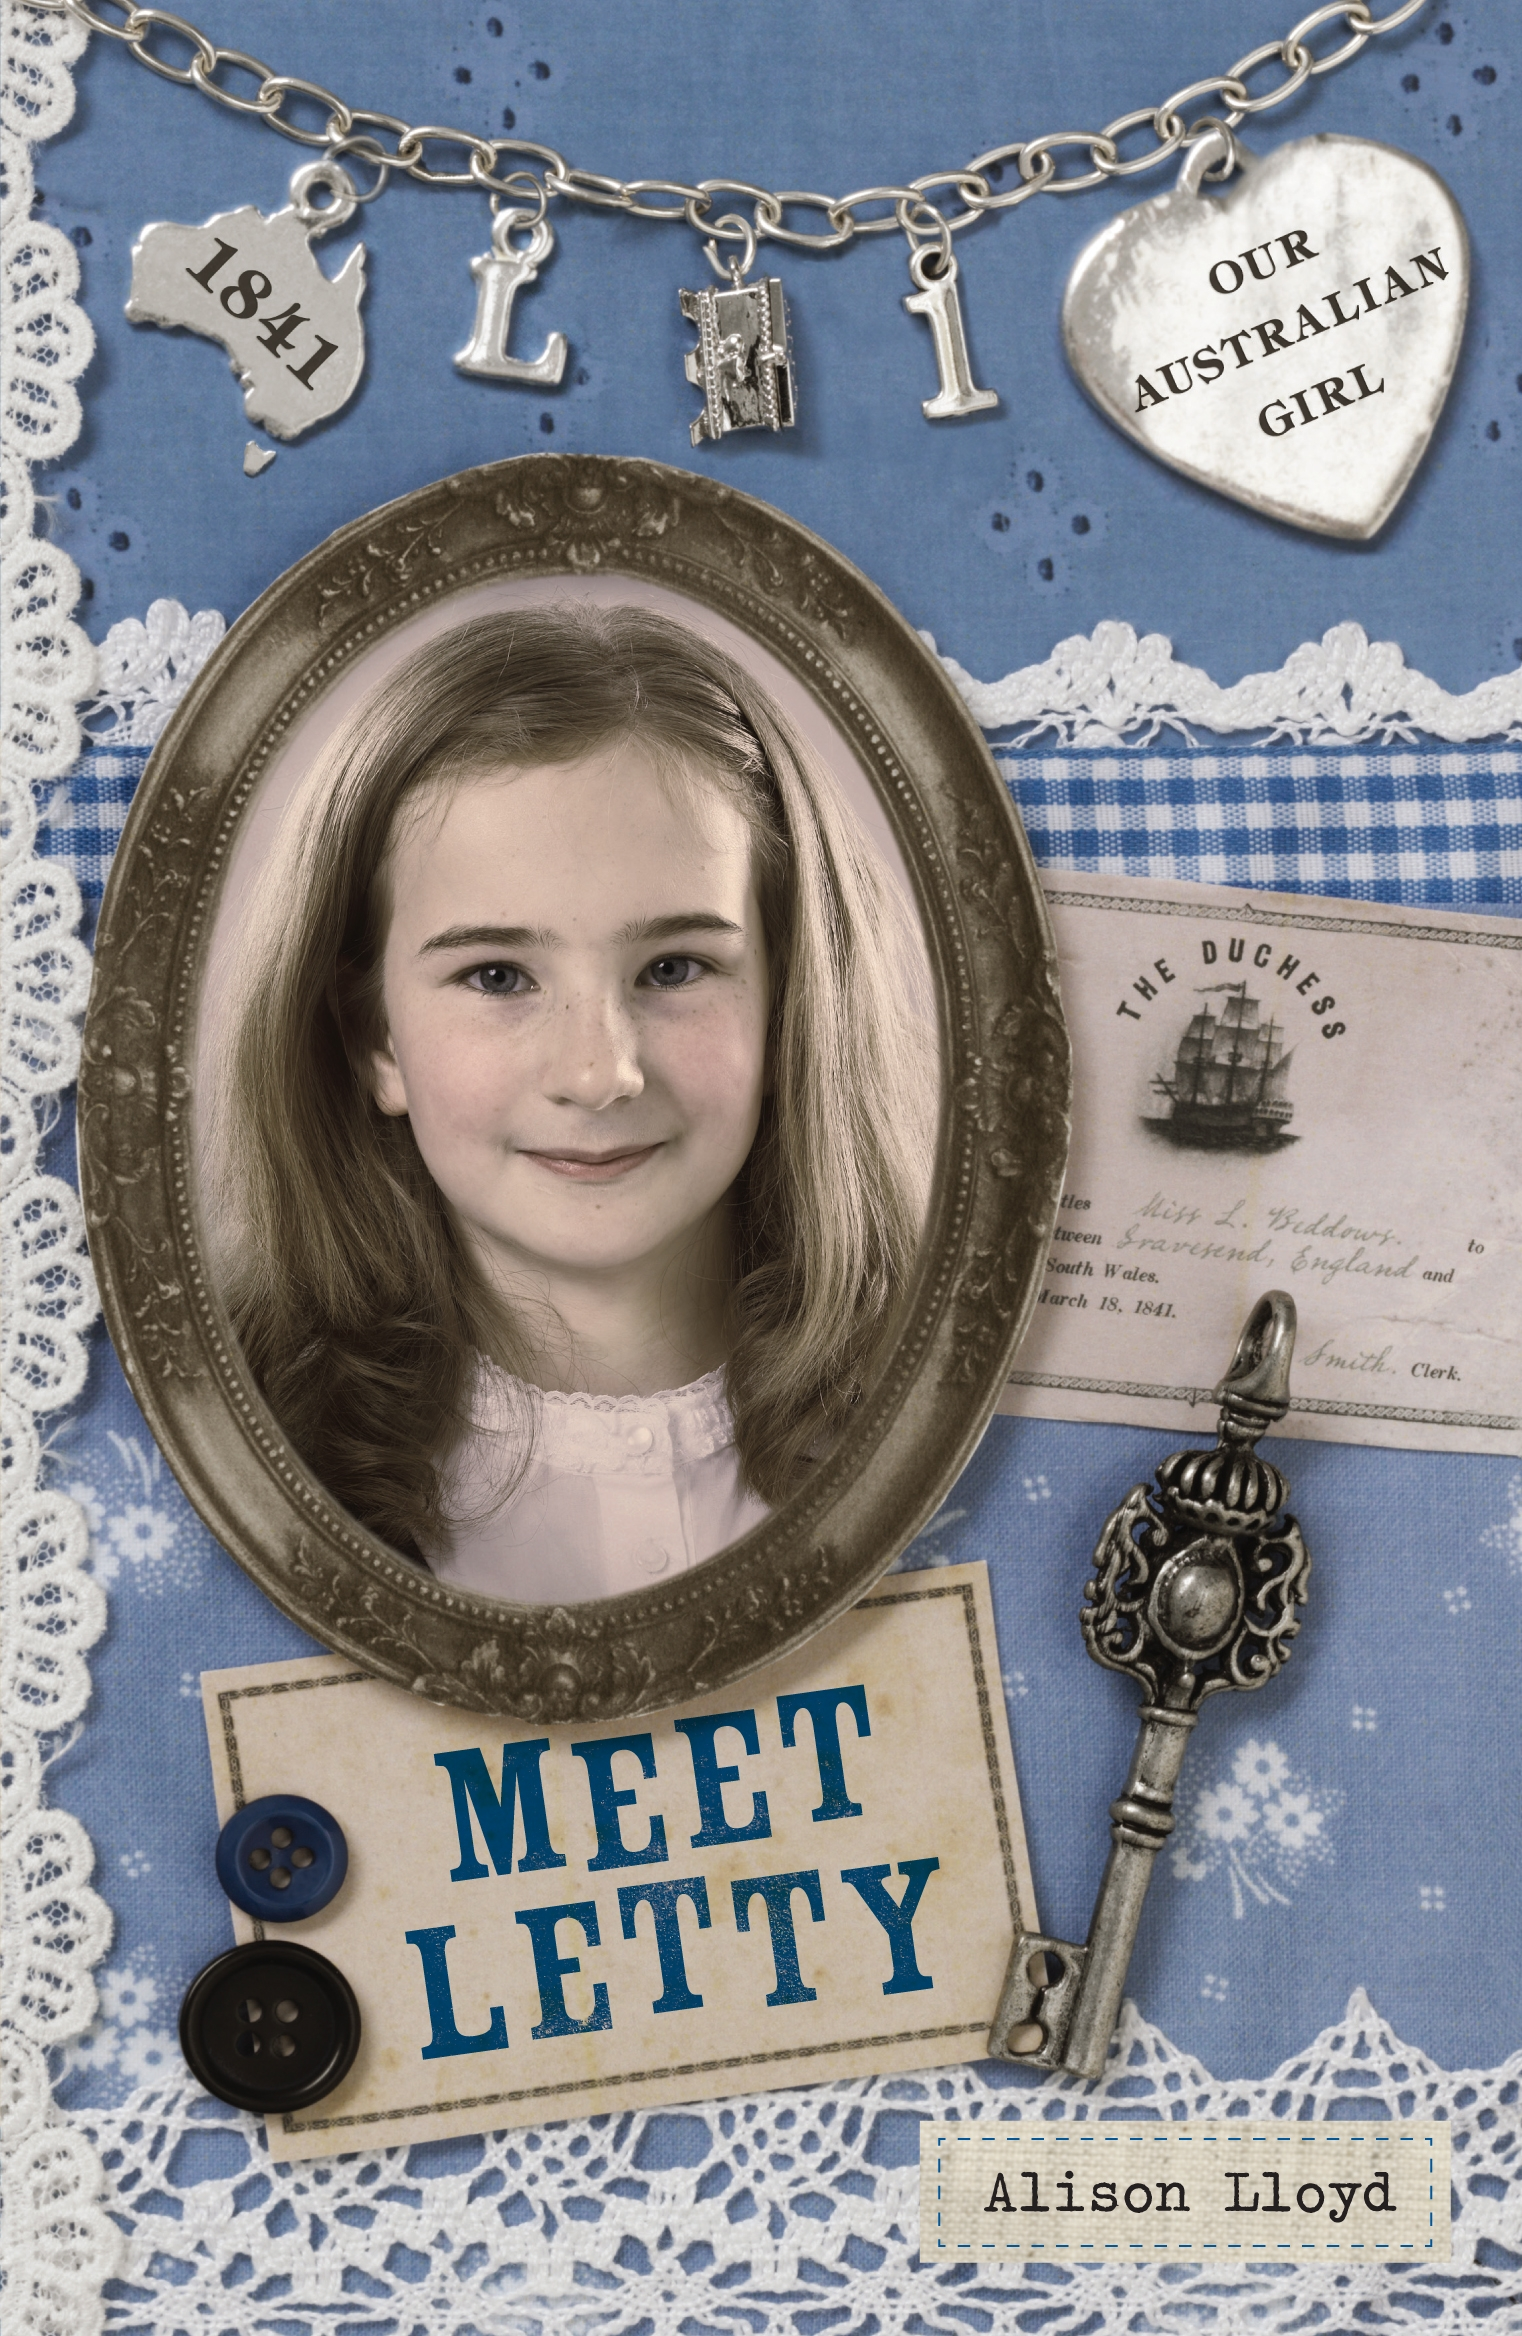 Our Australian Girl Meet Letty Book 1